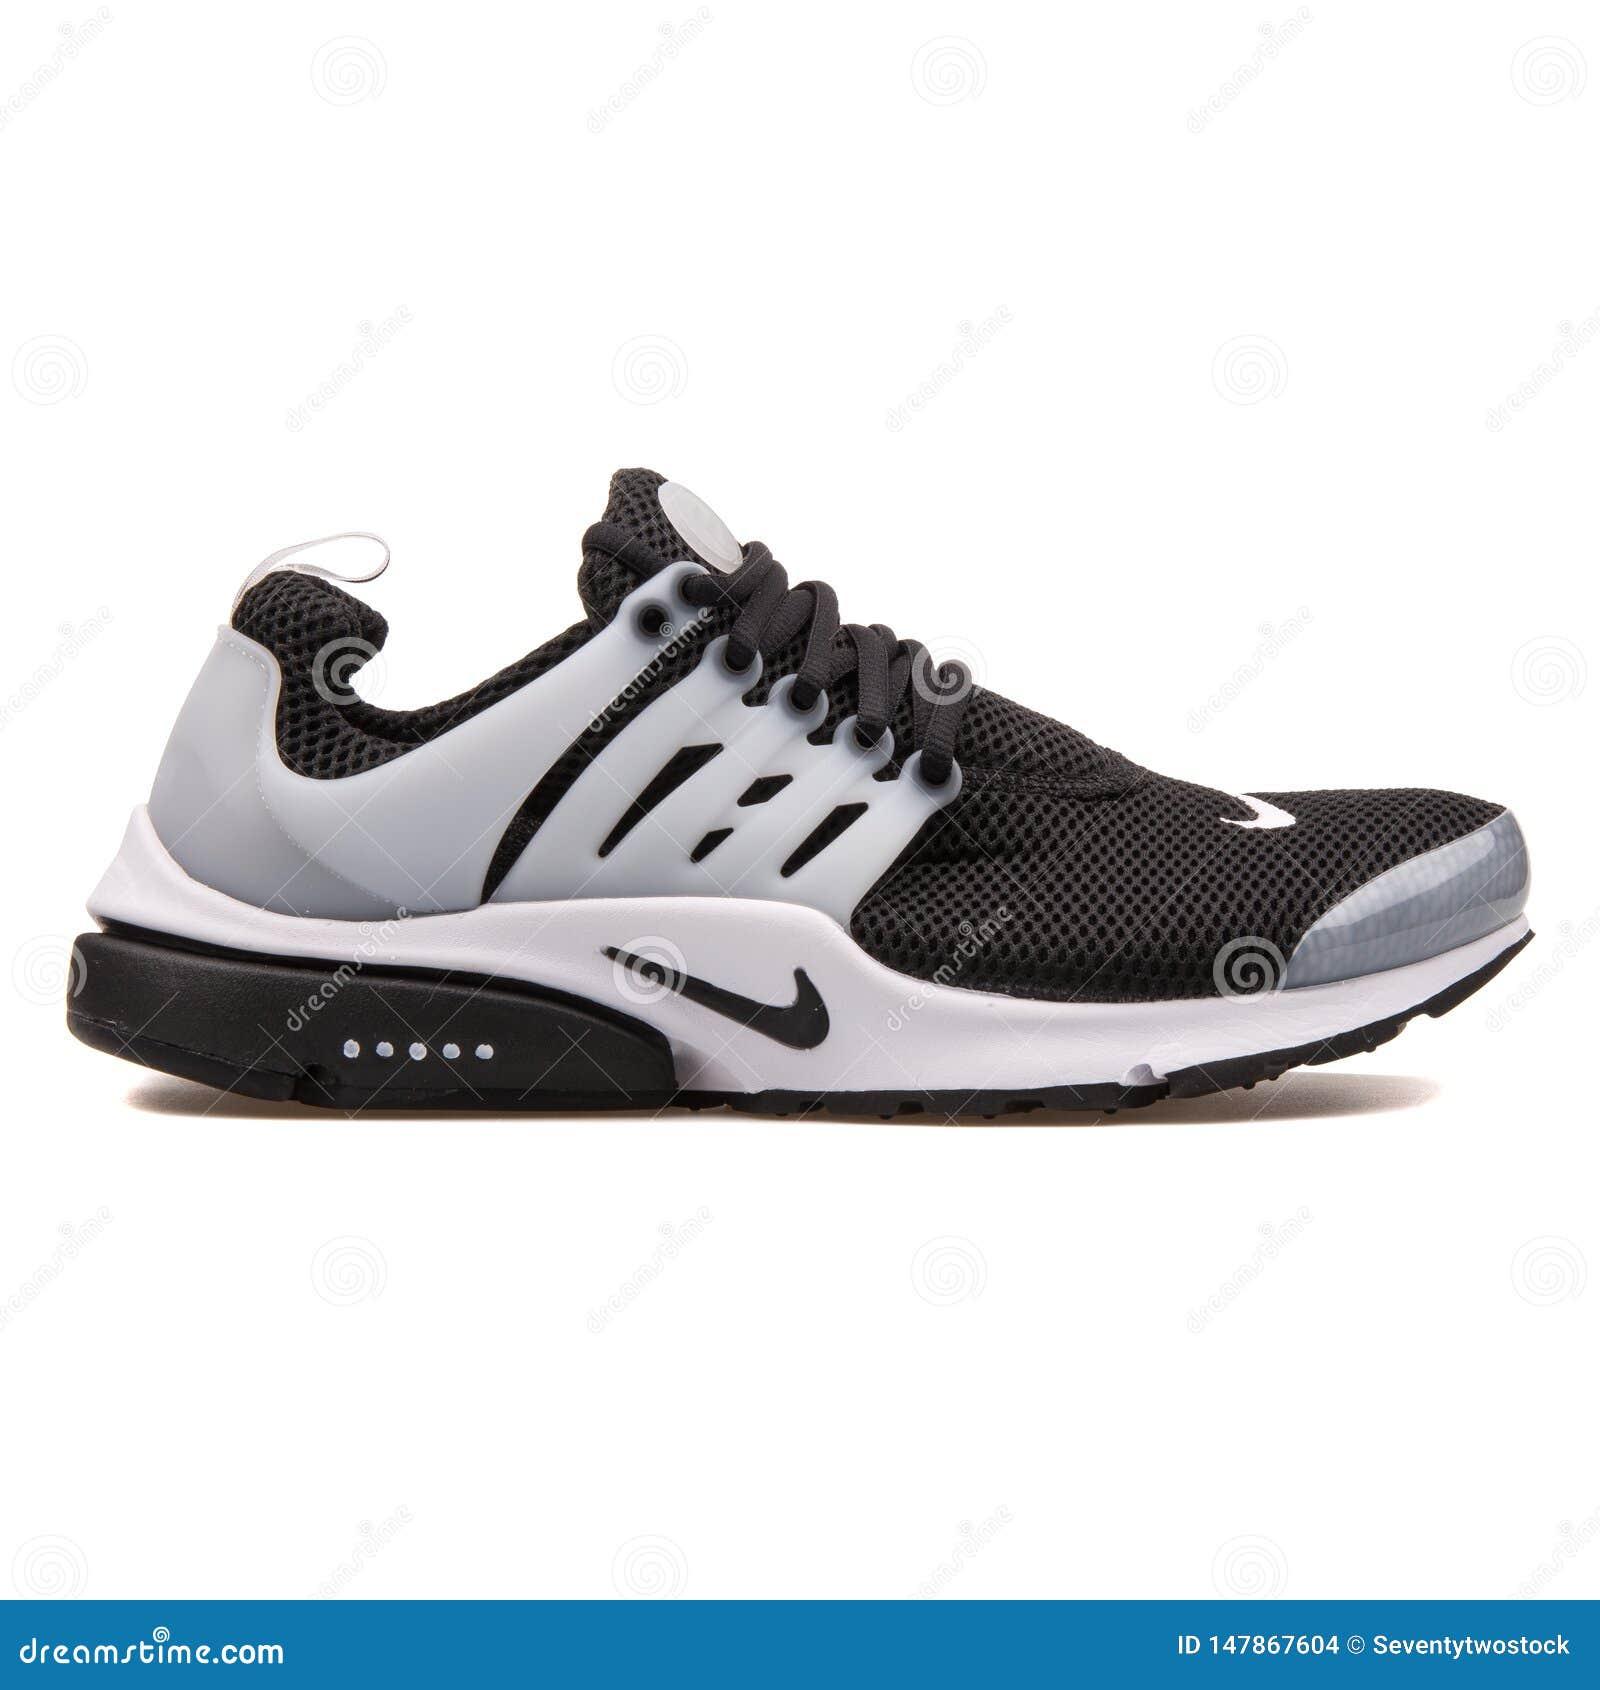 Nike Air Presto Black And White Sneaker